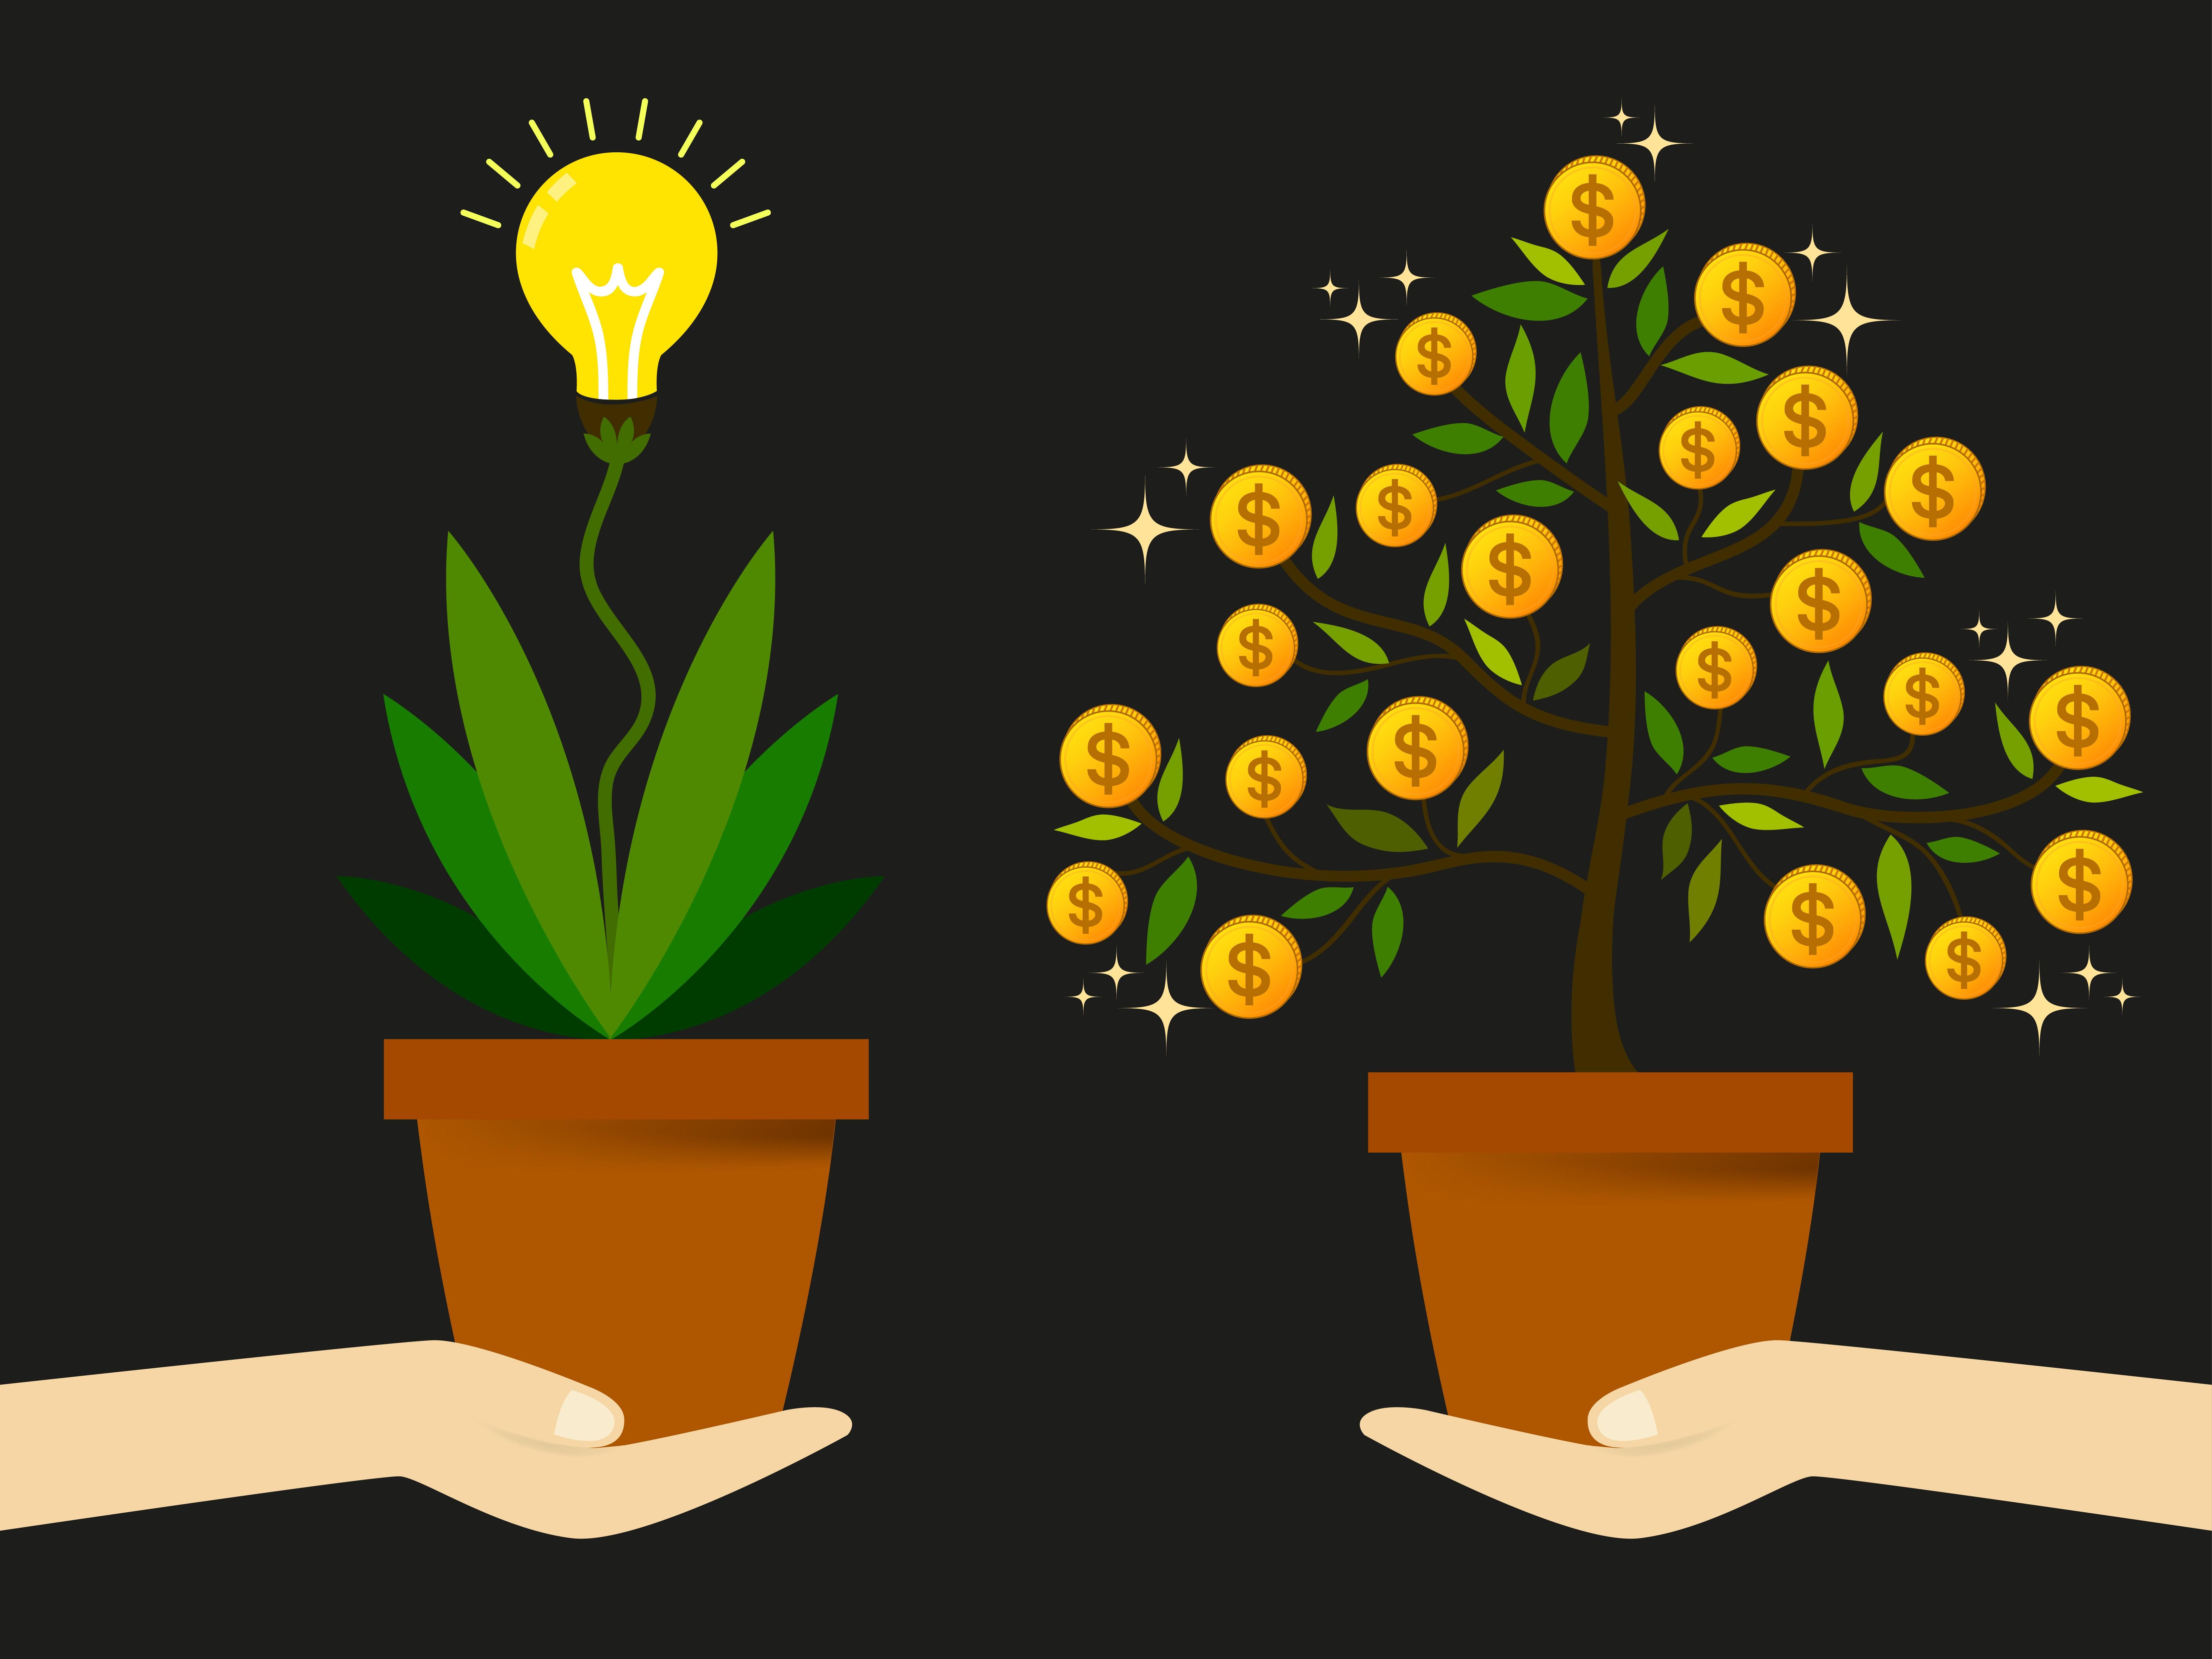 content_marketing_-_generate_revenue_shutterstock_276274274.jpg